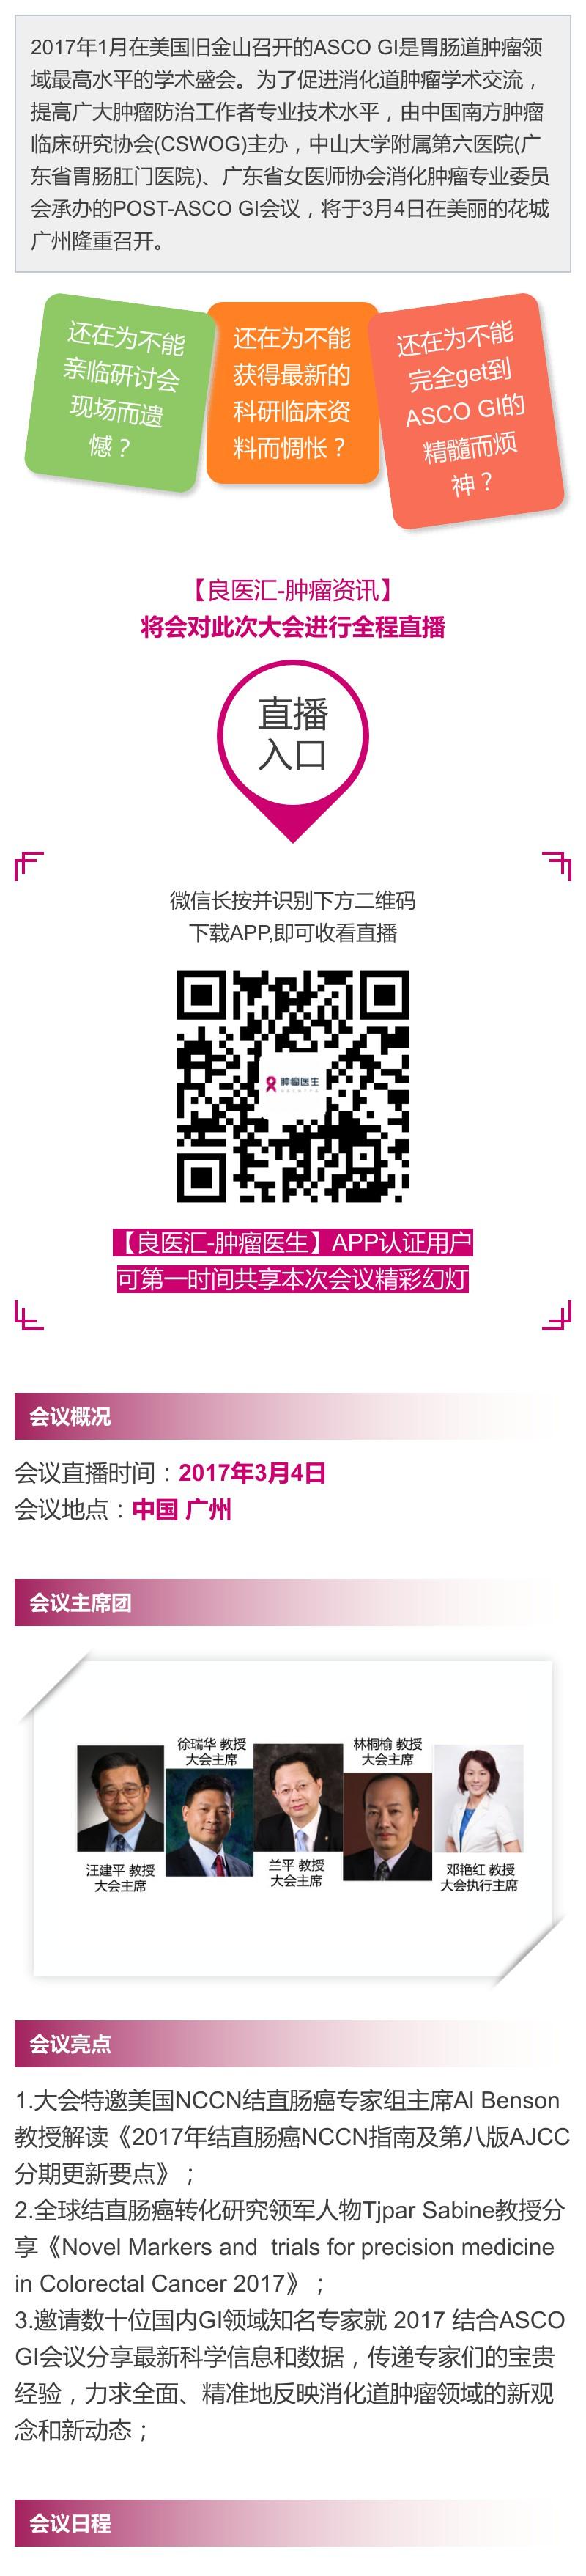 show_34336644_1488500670853.jpg